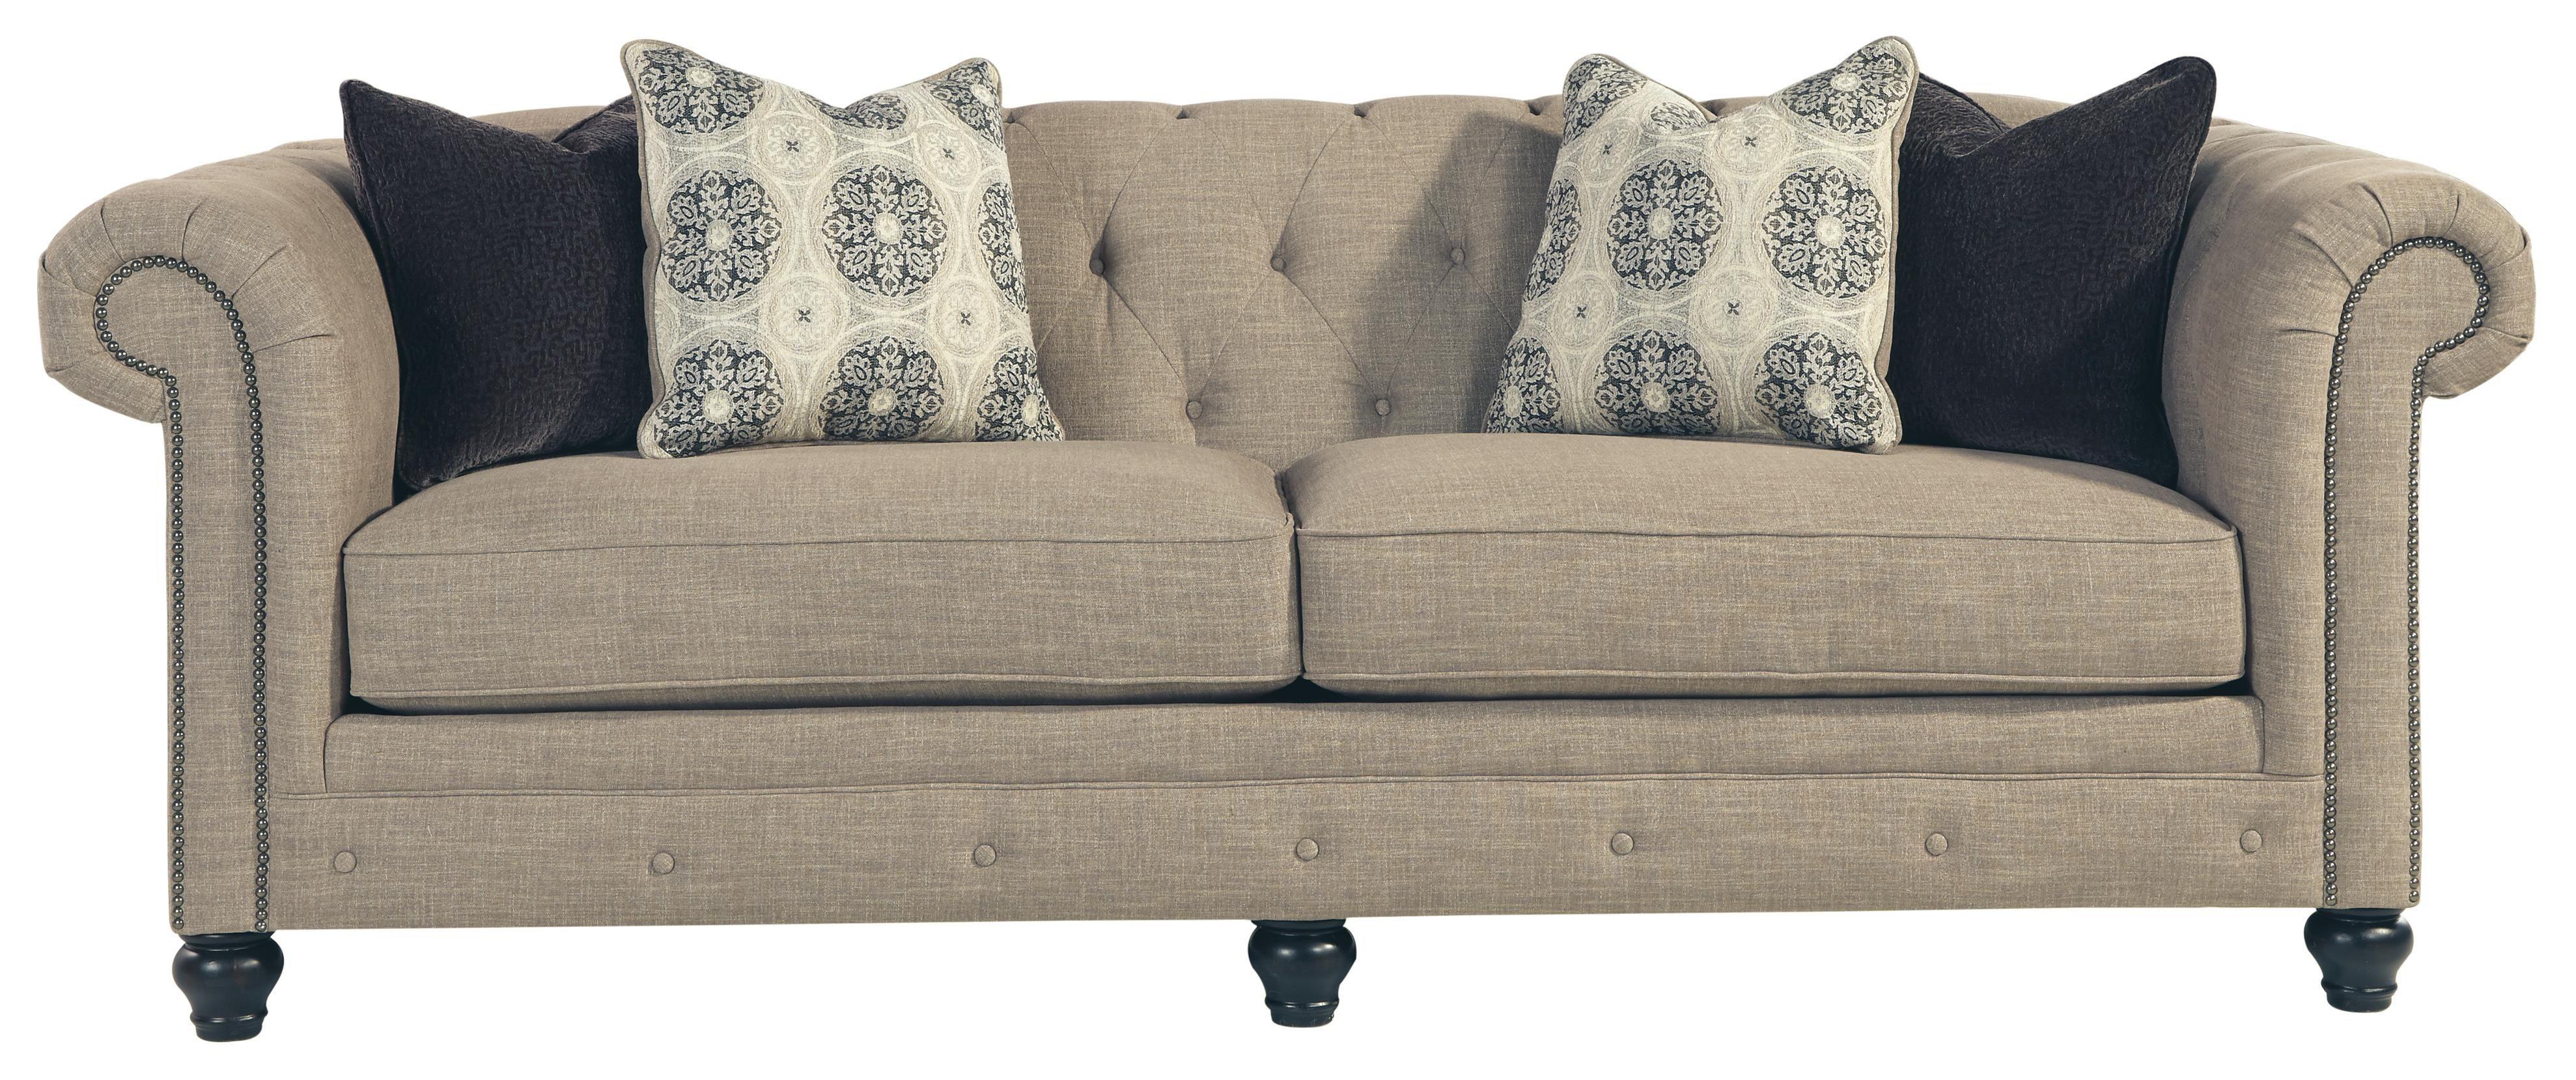 Benchcraft Azlyn Sofa Item Number 9940238 Living Room Sofa